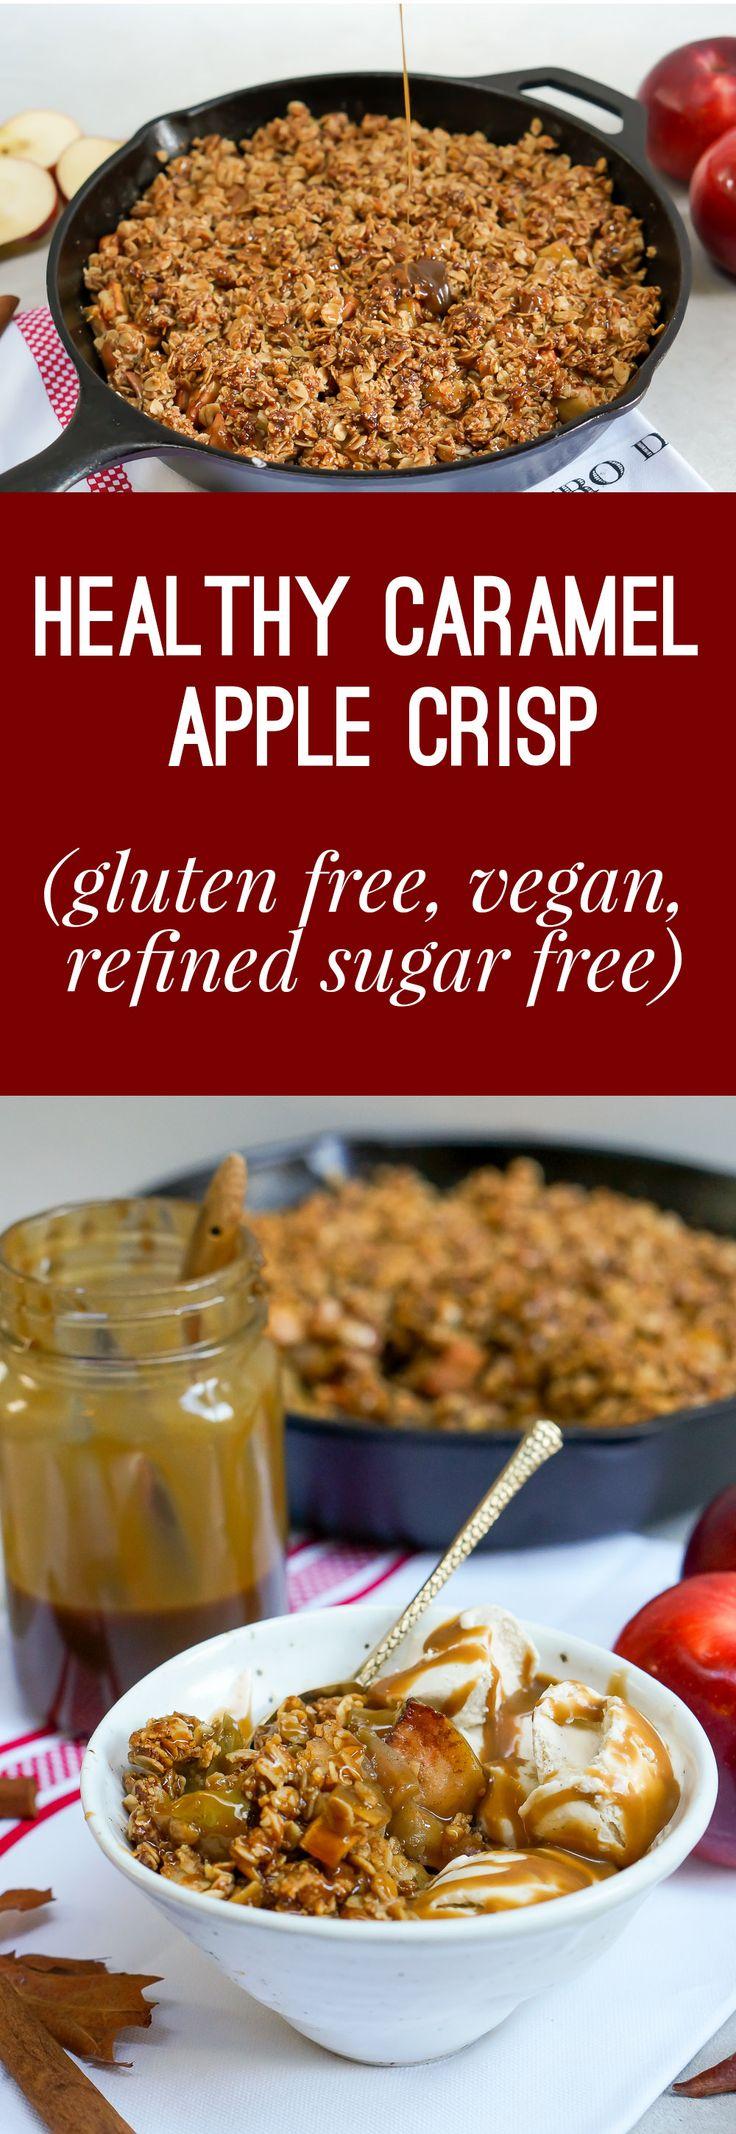 Vegan, Gluten Free, Refined Sugar Free Healthy Caramel Apple Crisp